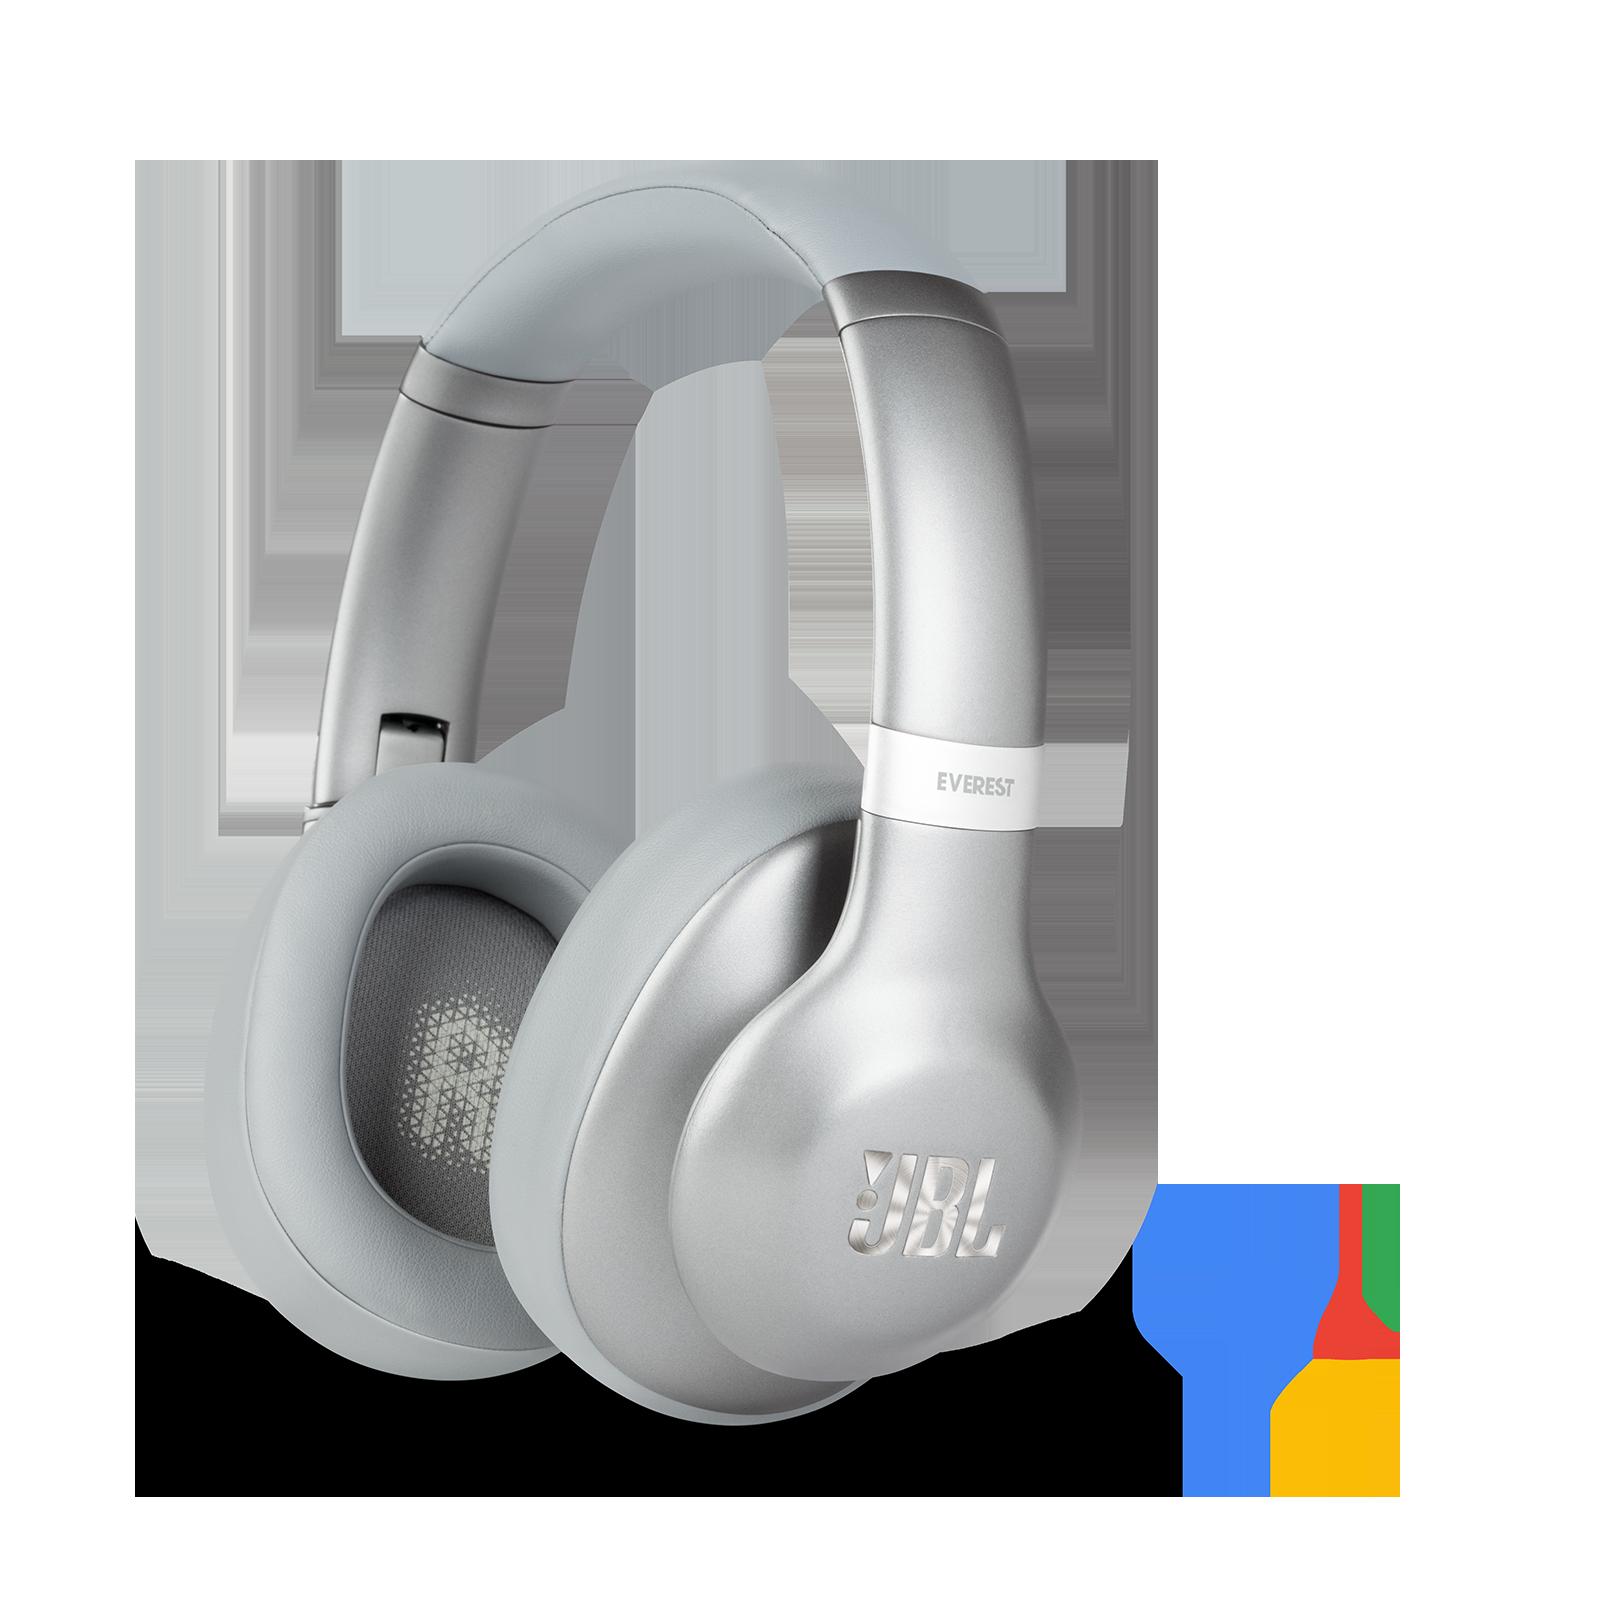 Jbl Everest 710ga Wireless Over Ear Headphones